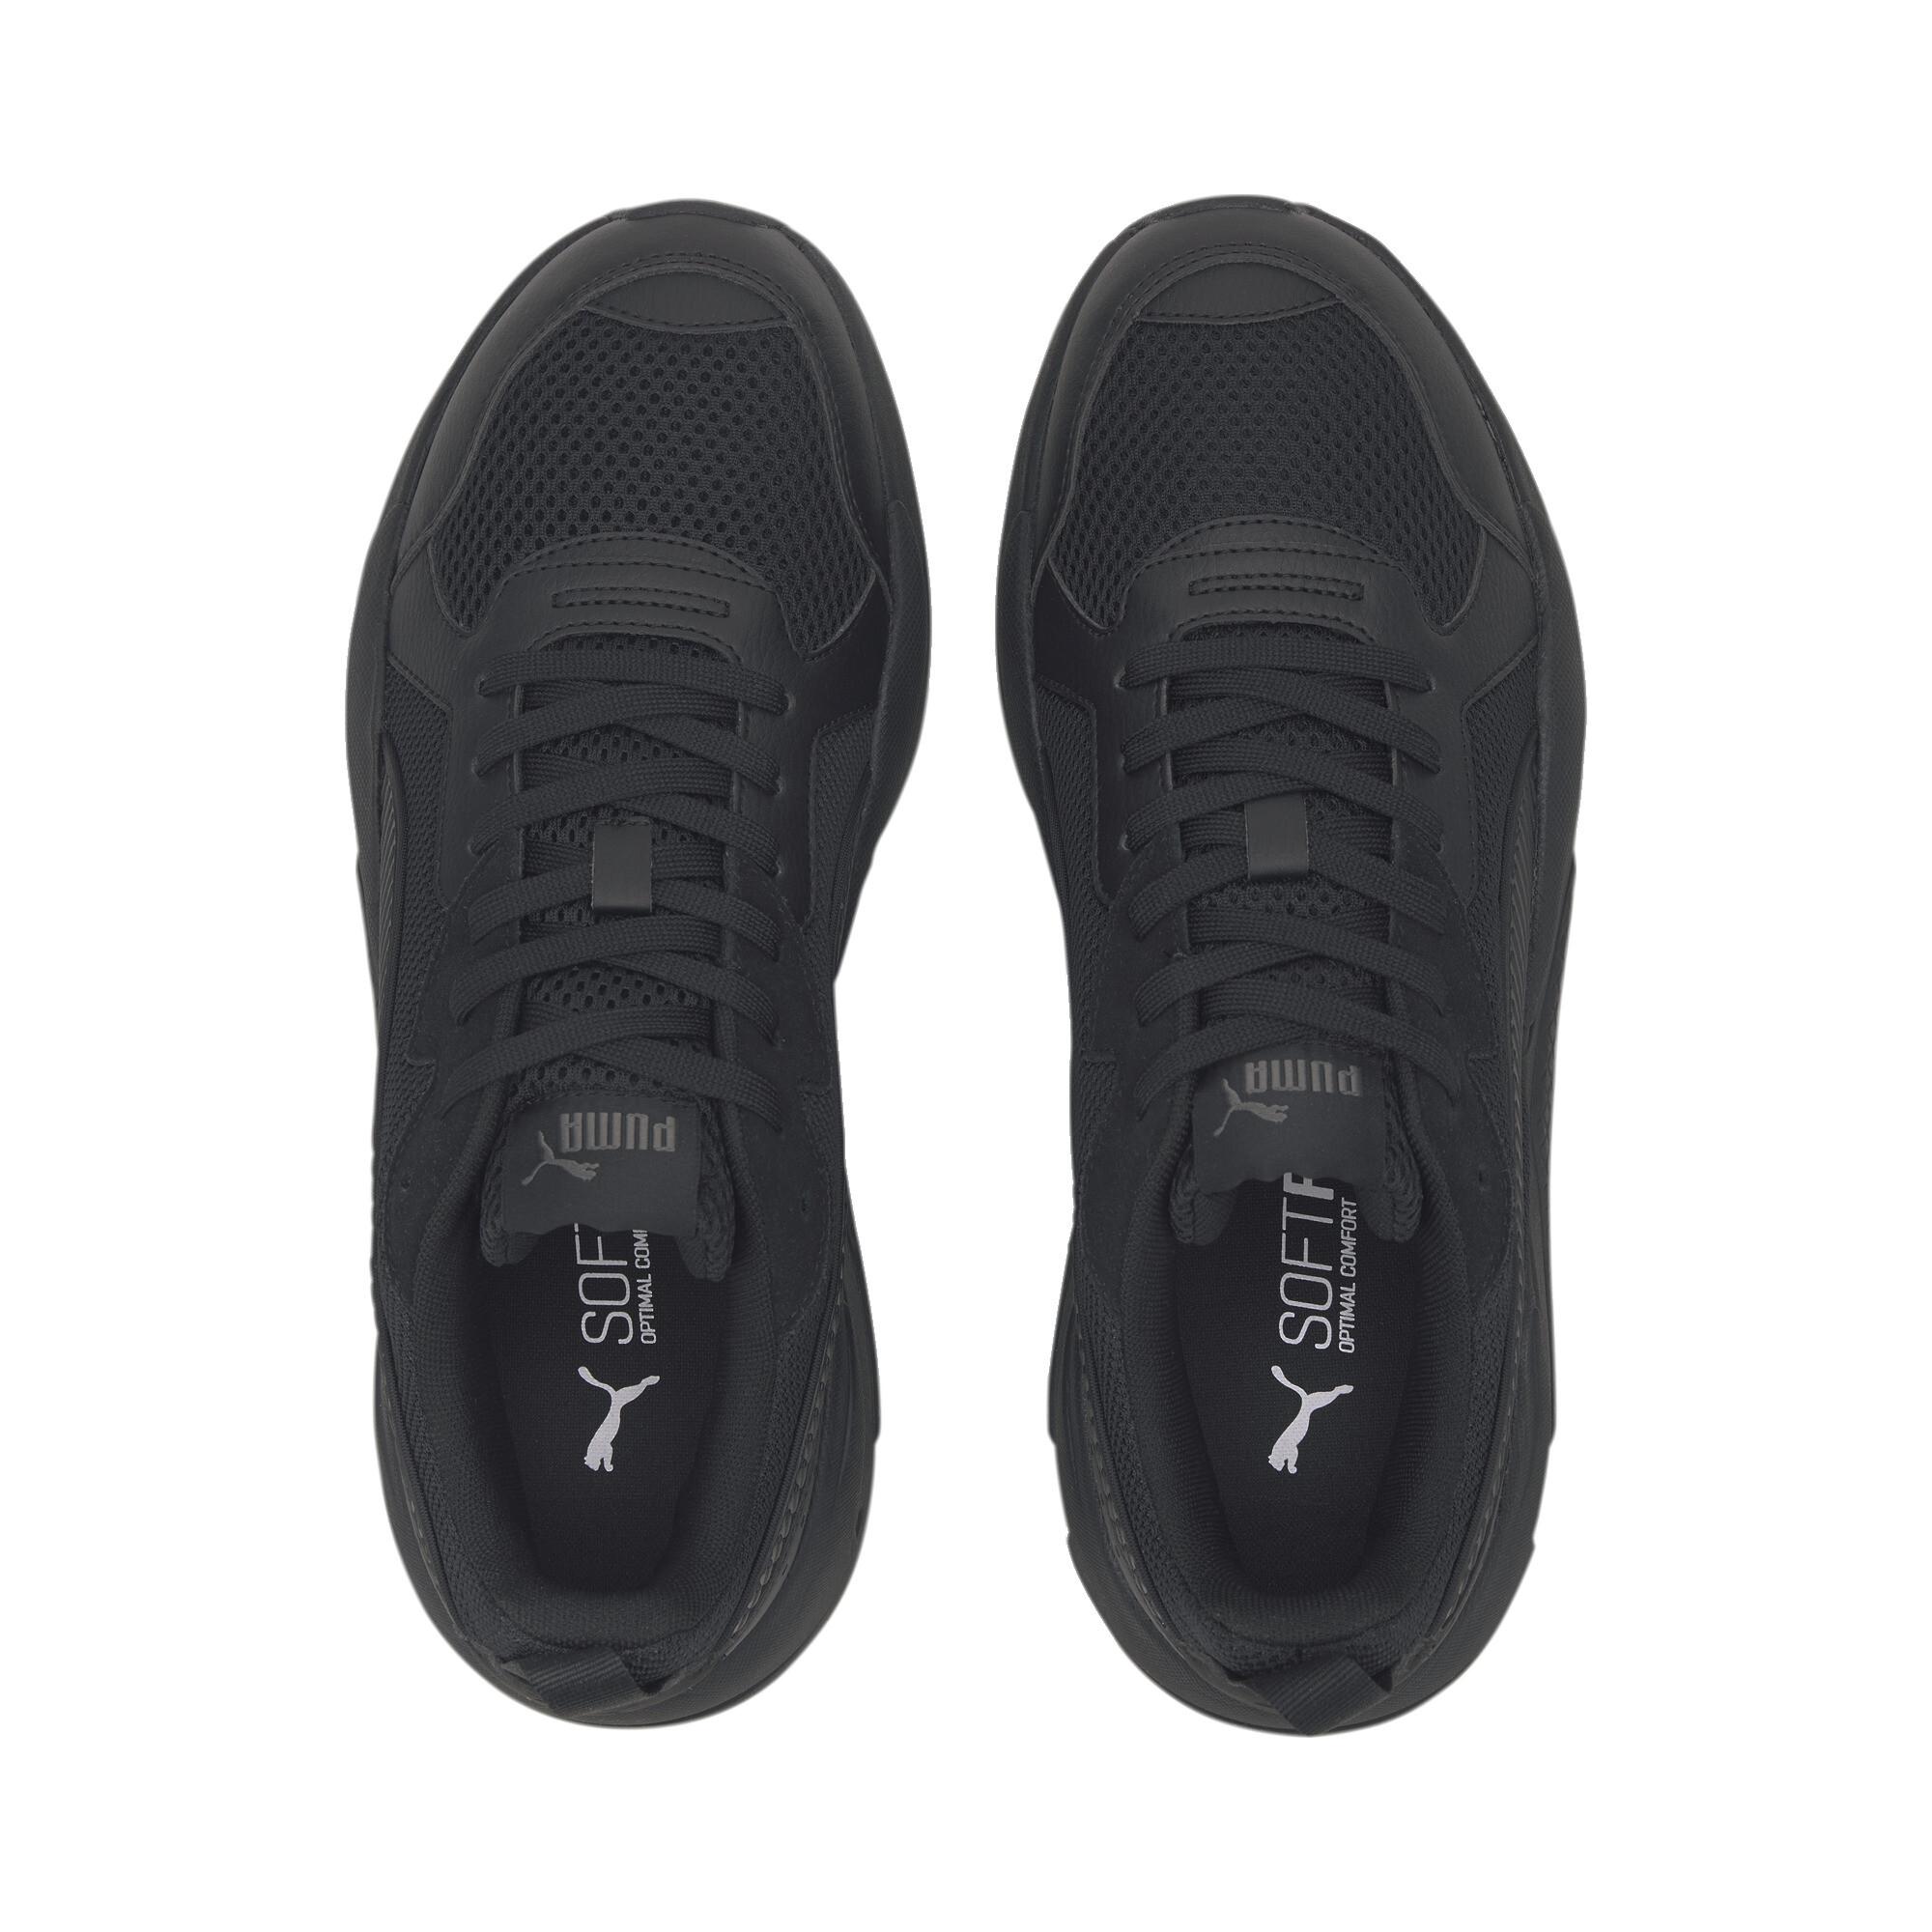 PUMA-Men-039-s-X-RAY-Sneakers thumbnail 22